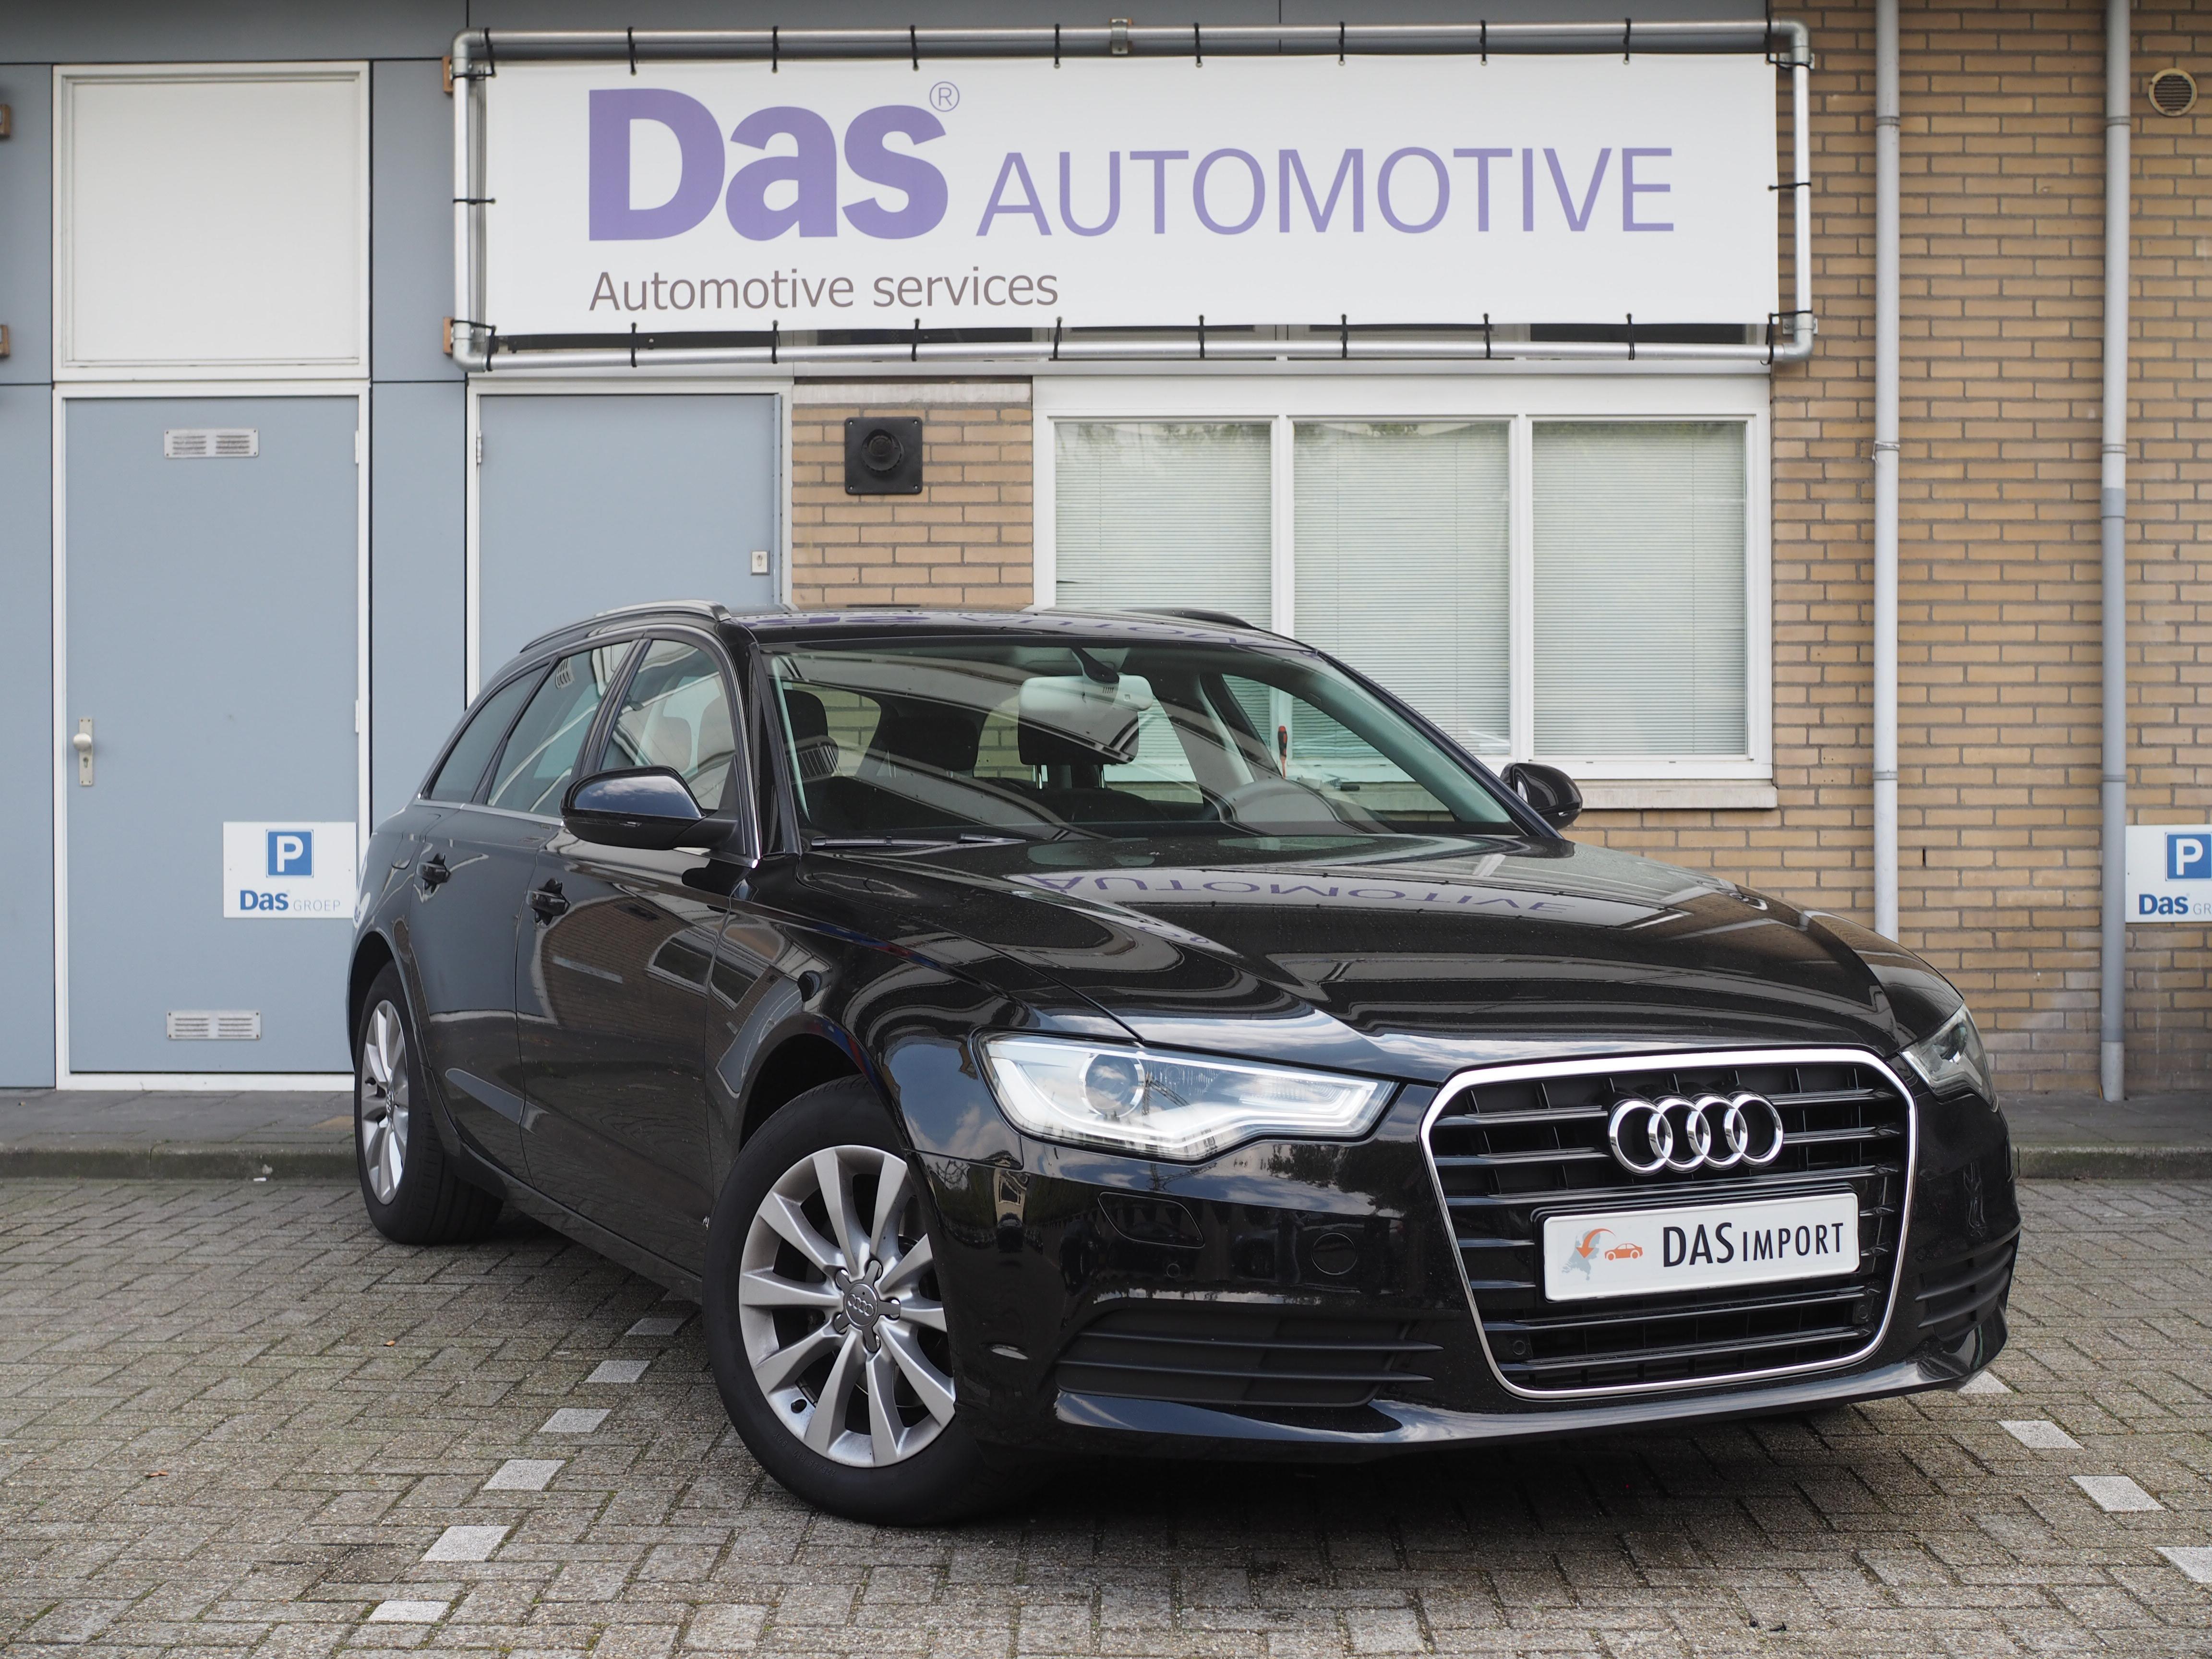 Importauto: Audi A6 Avant Diesel 2.0 TDI 130kW multitronic 3/2013